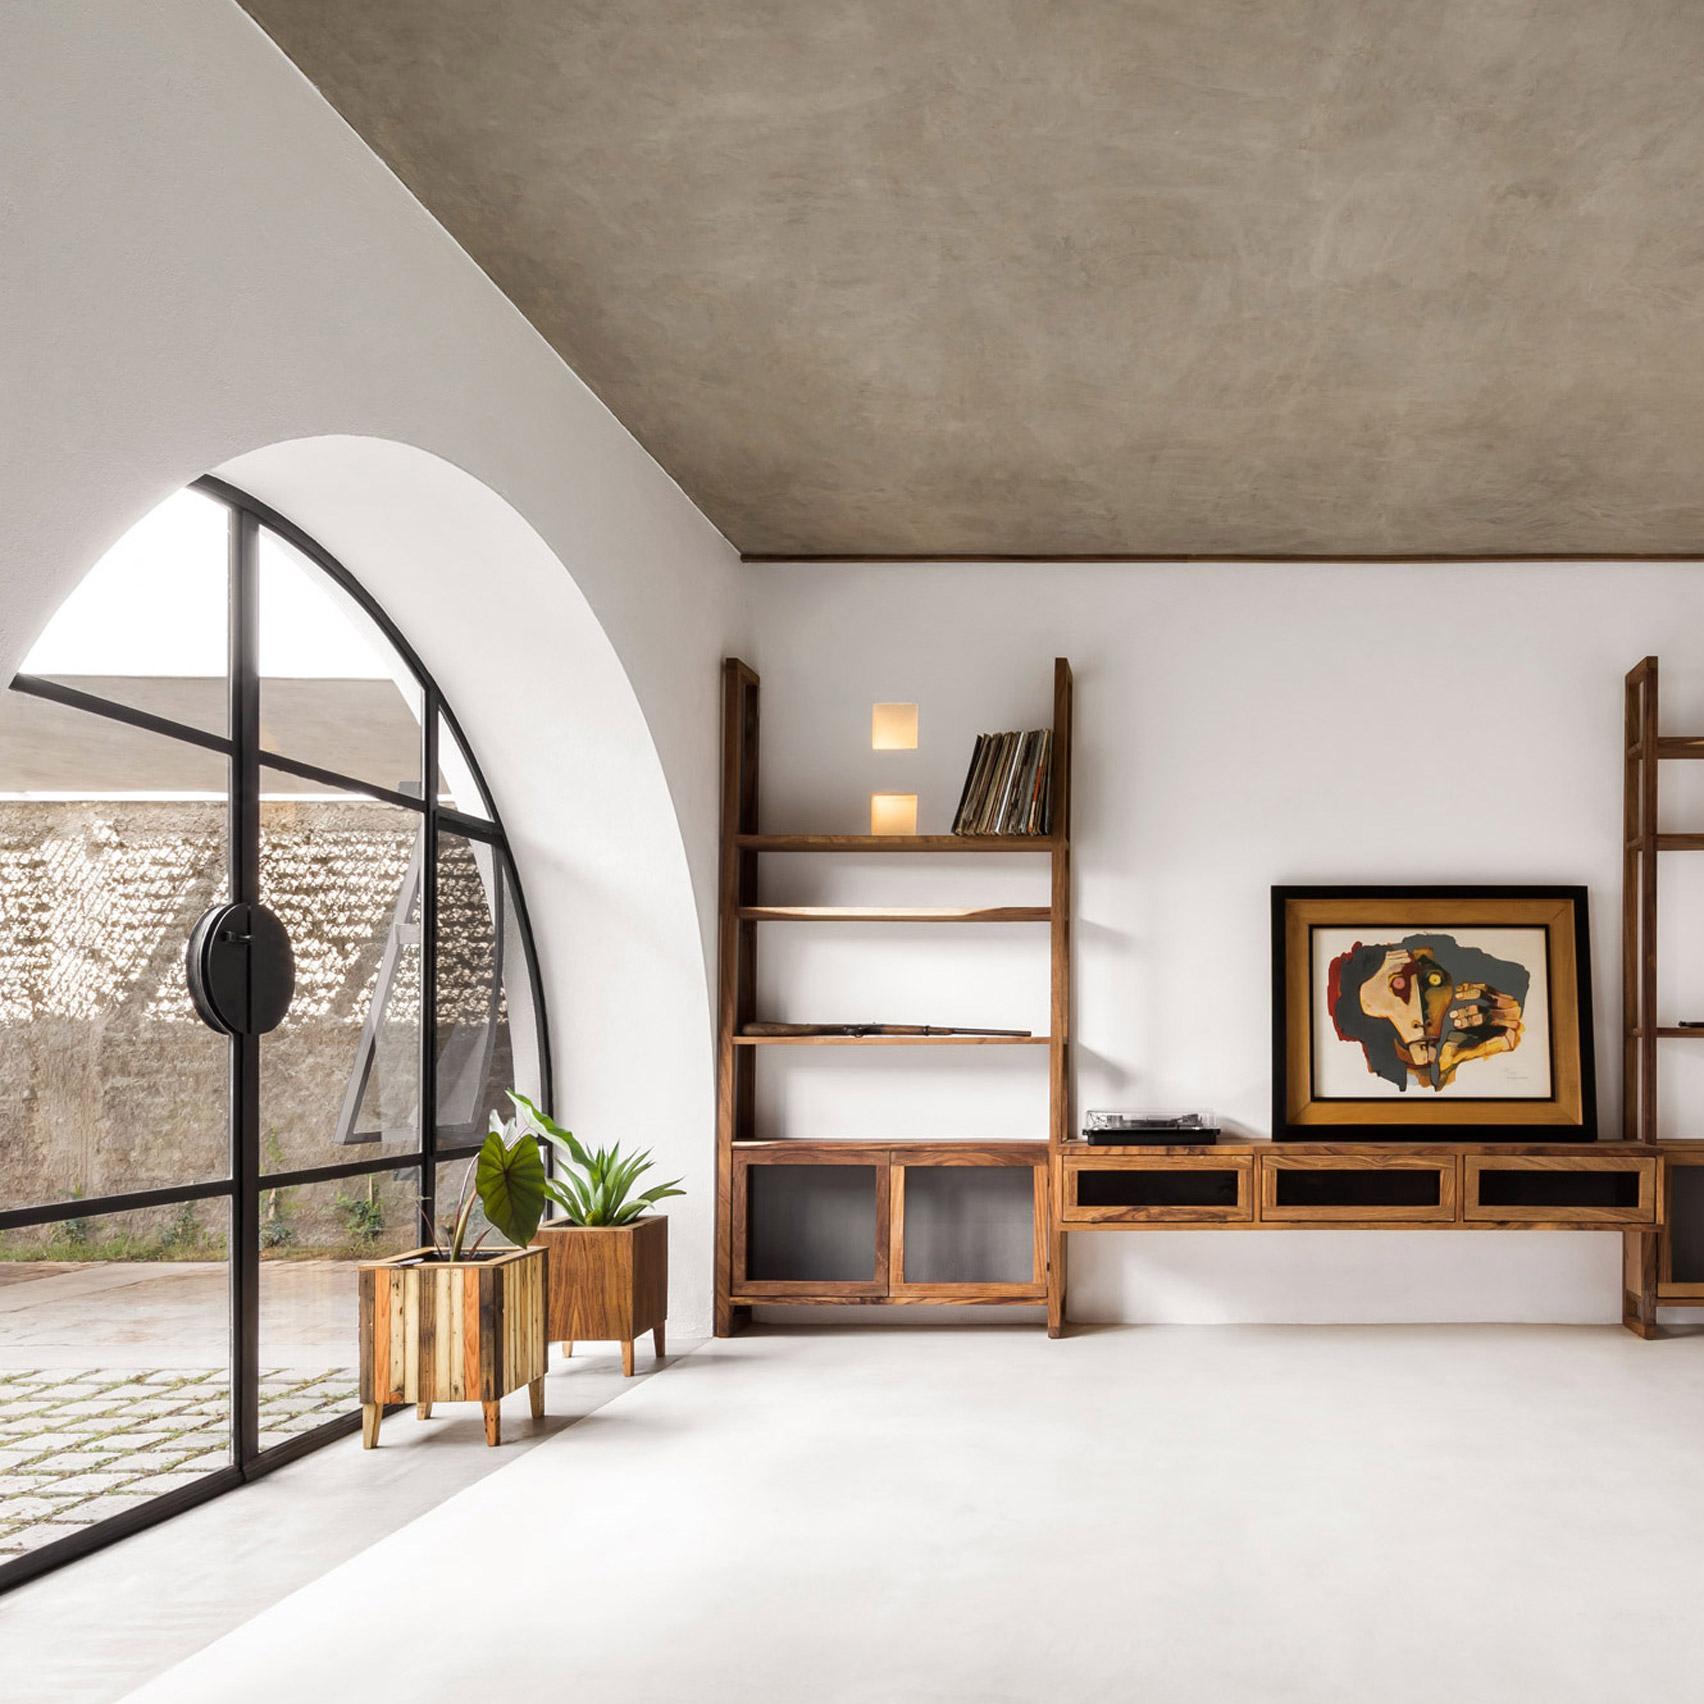 Dezeen's top home interiors of 2020: Casa A690 by Delfino Lozano